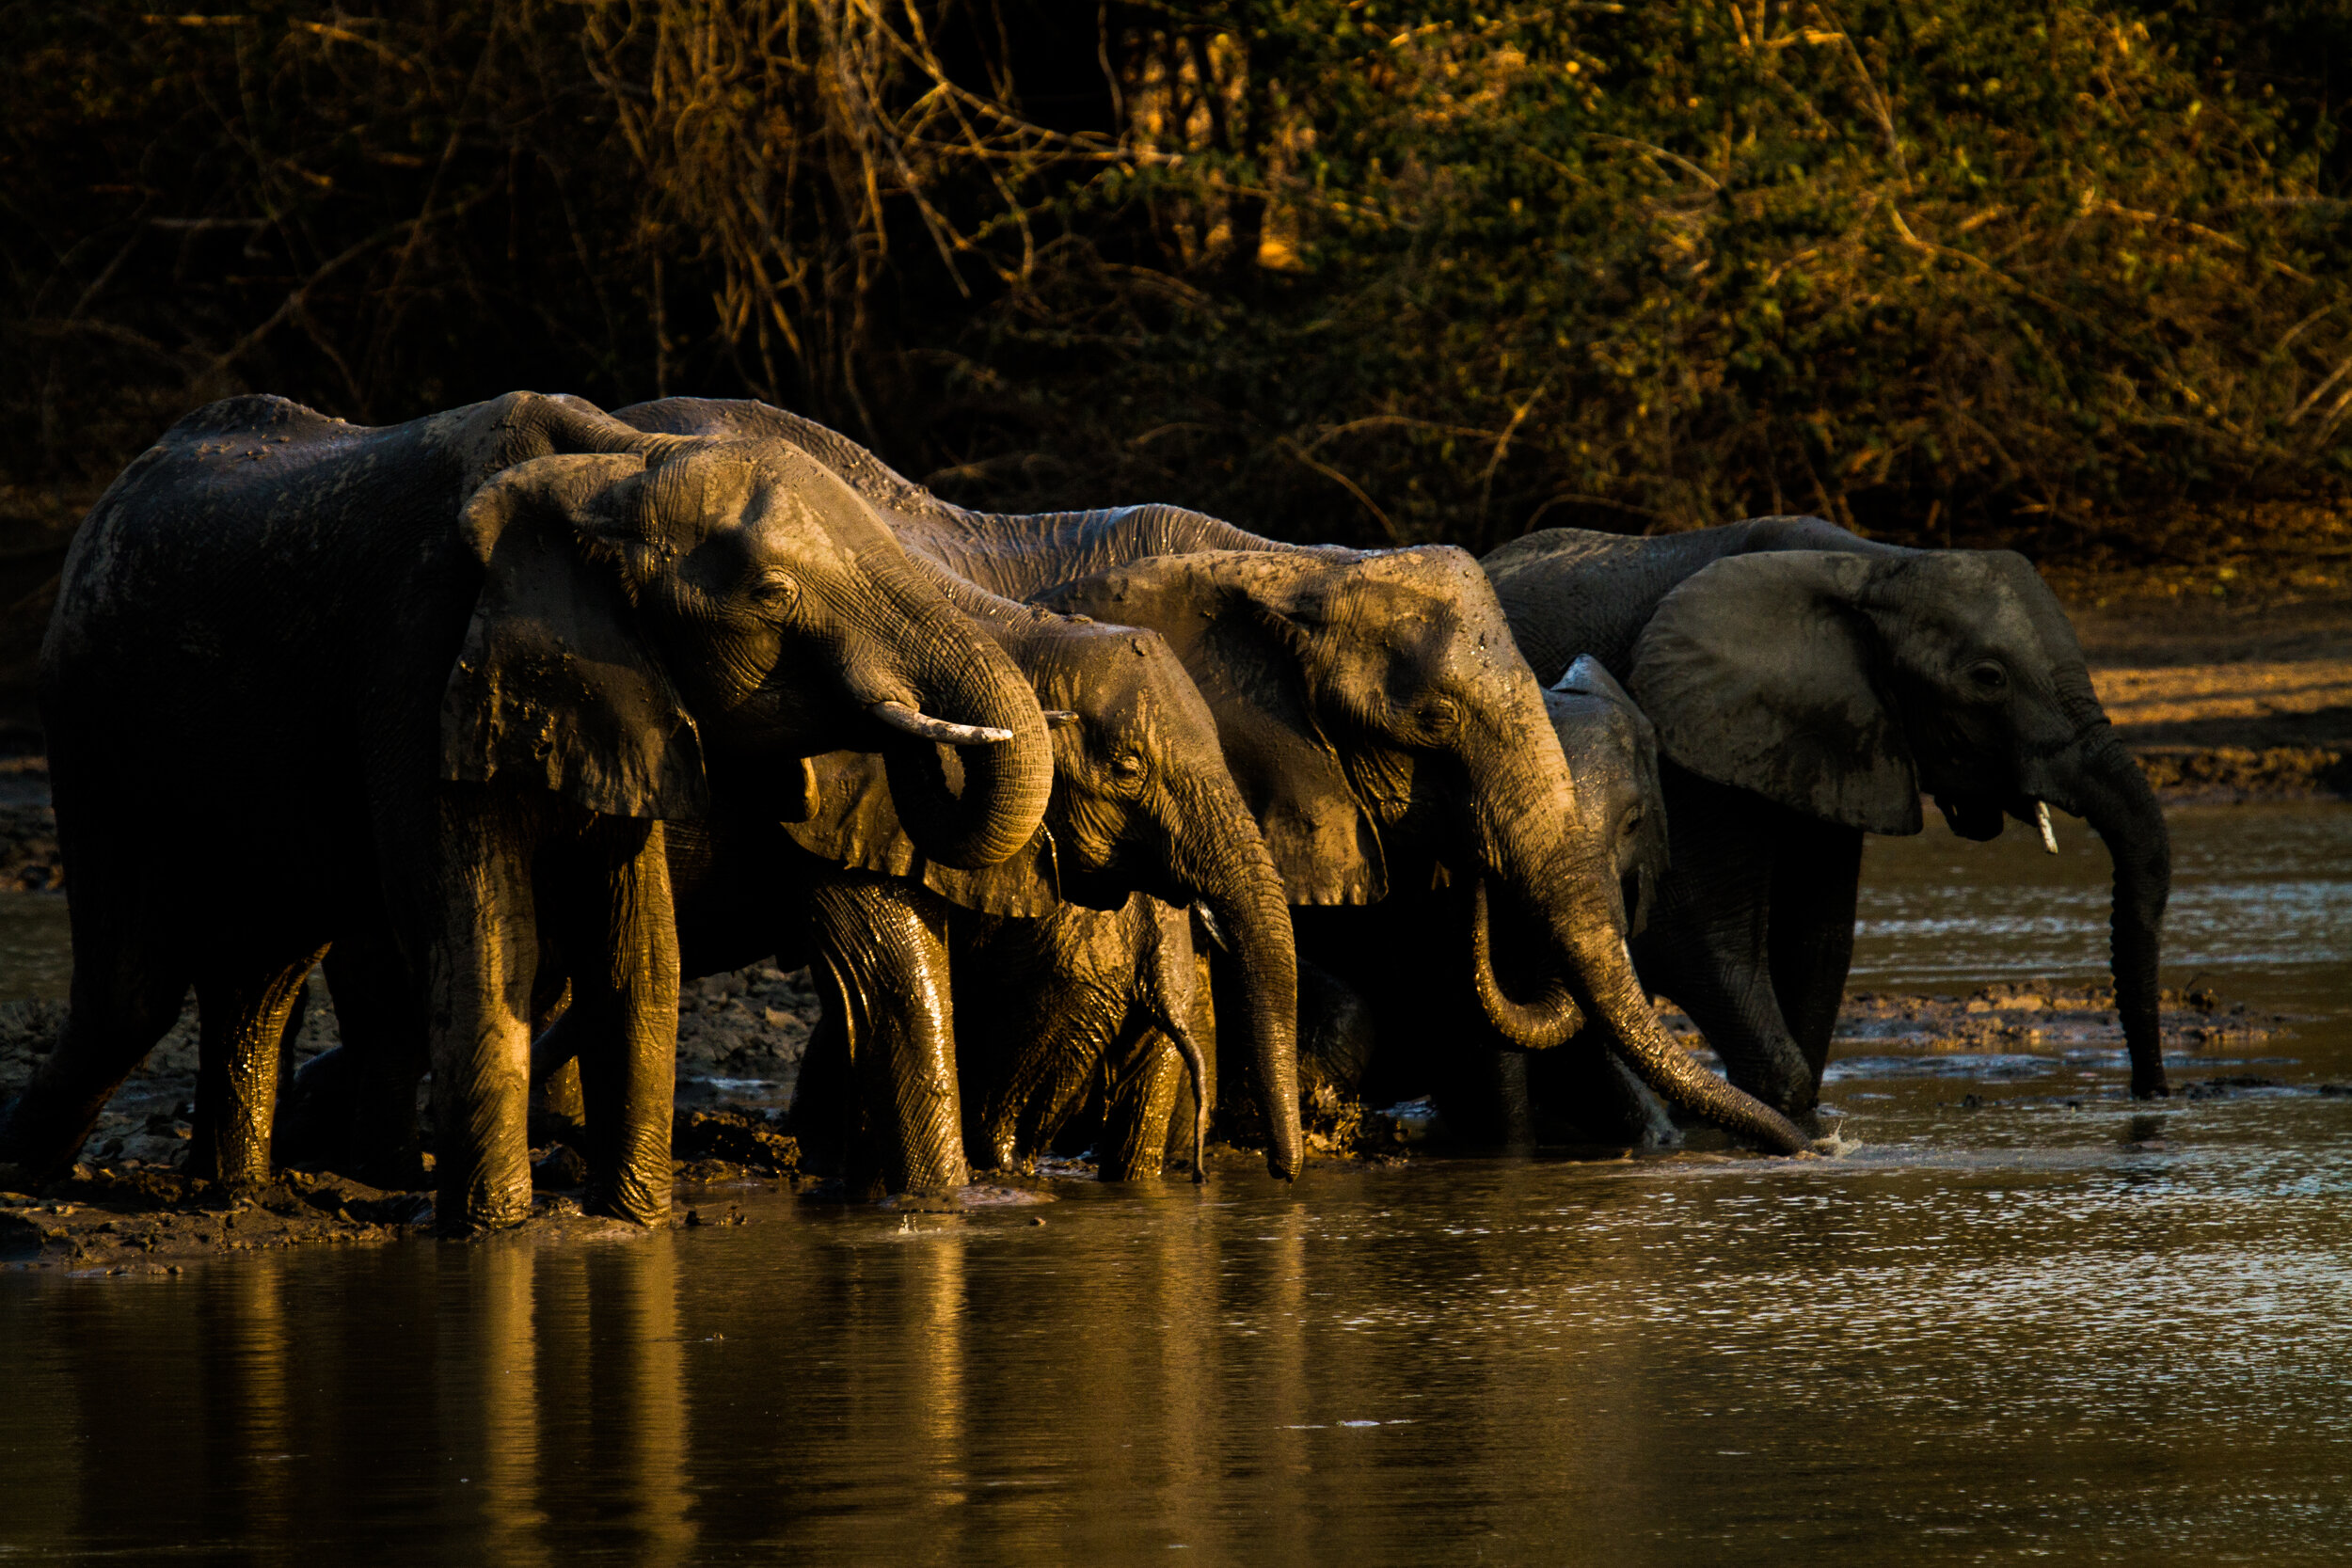 elephant_herd_drinking_from_kanga_pan_wateringhole_mana_pools_national_park_zimbabwe_wildlife_safari_african_bush_camps.jpg